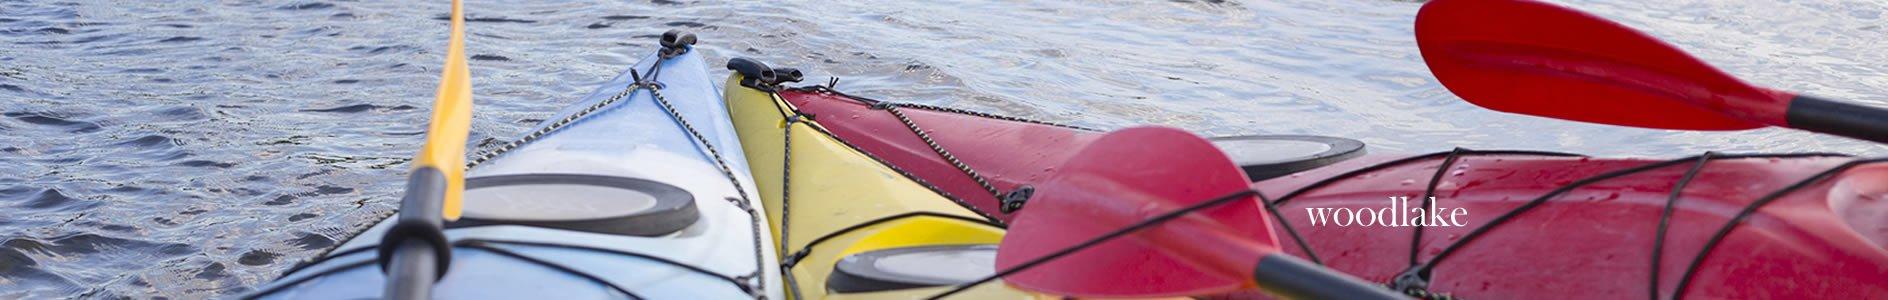 Kayak on Woodlake in Wilmington